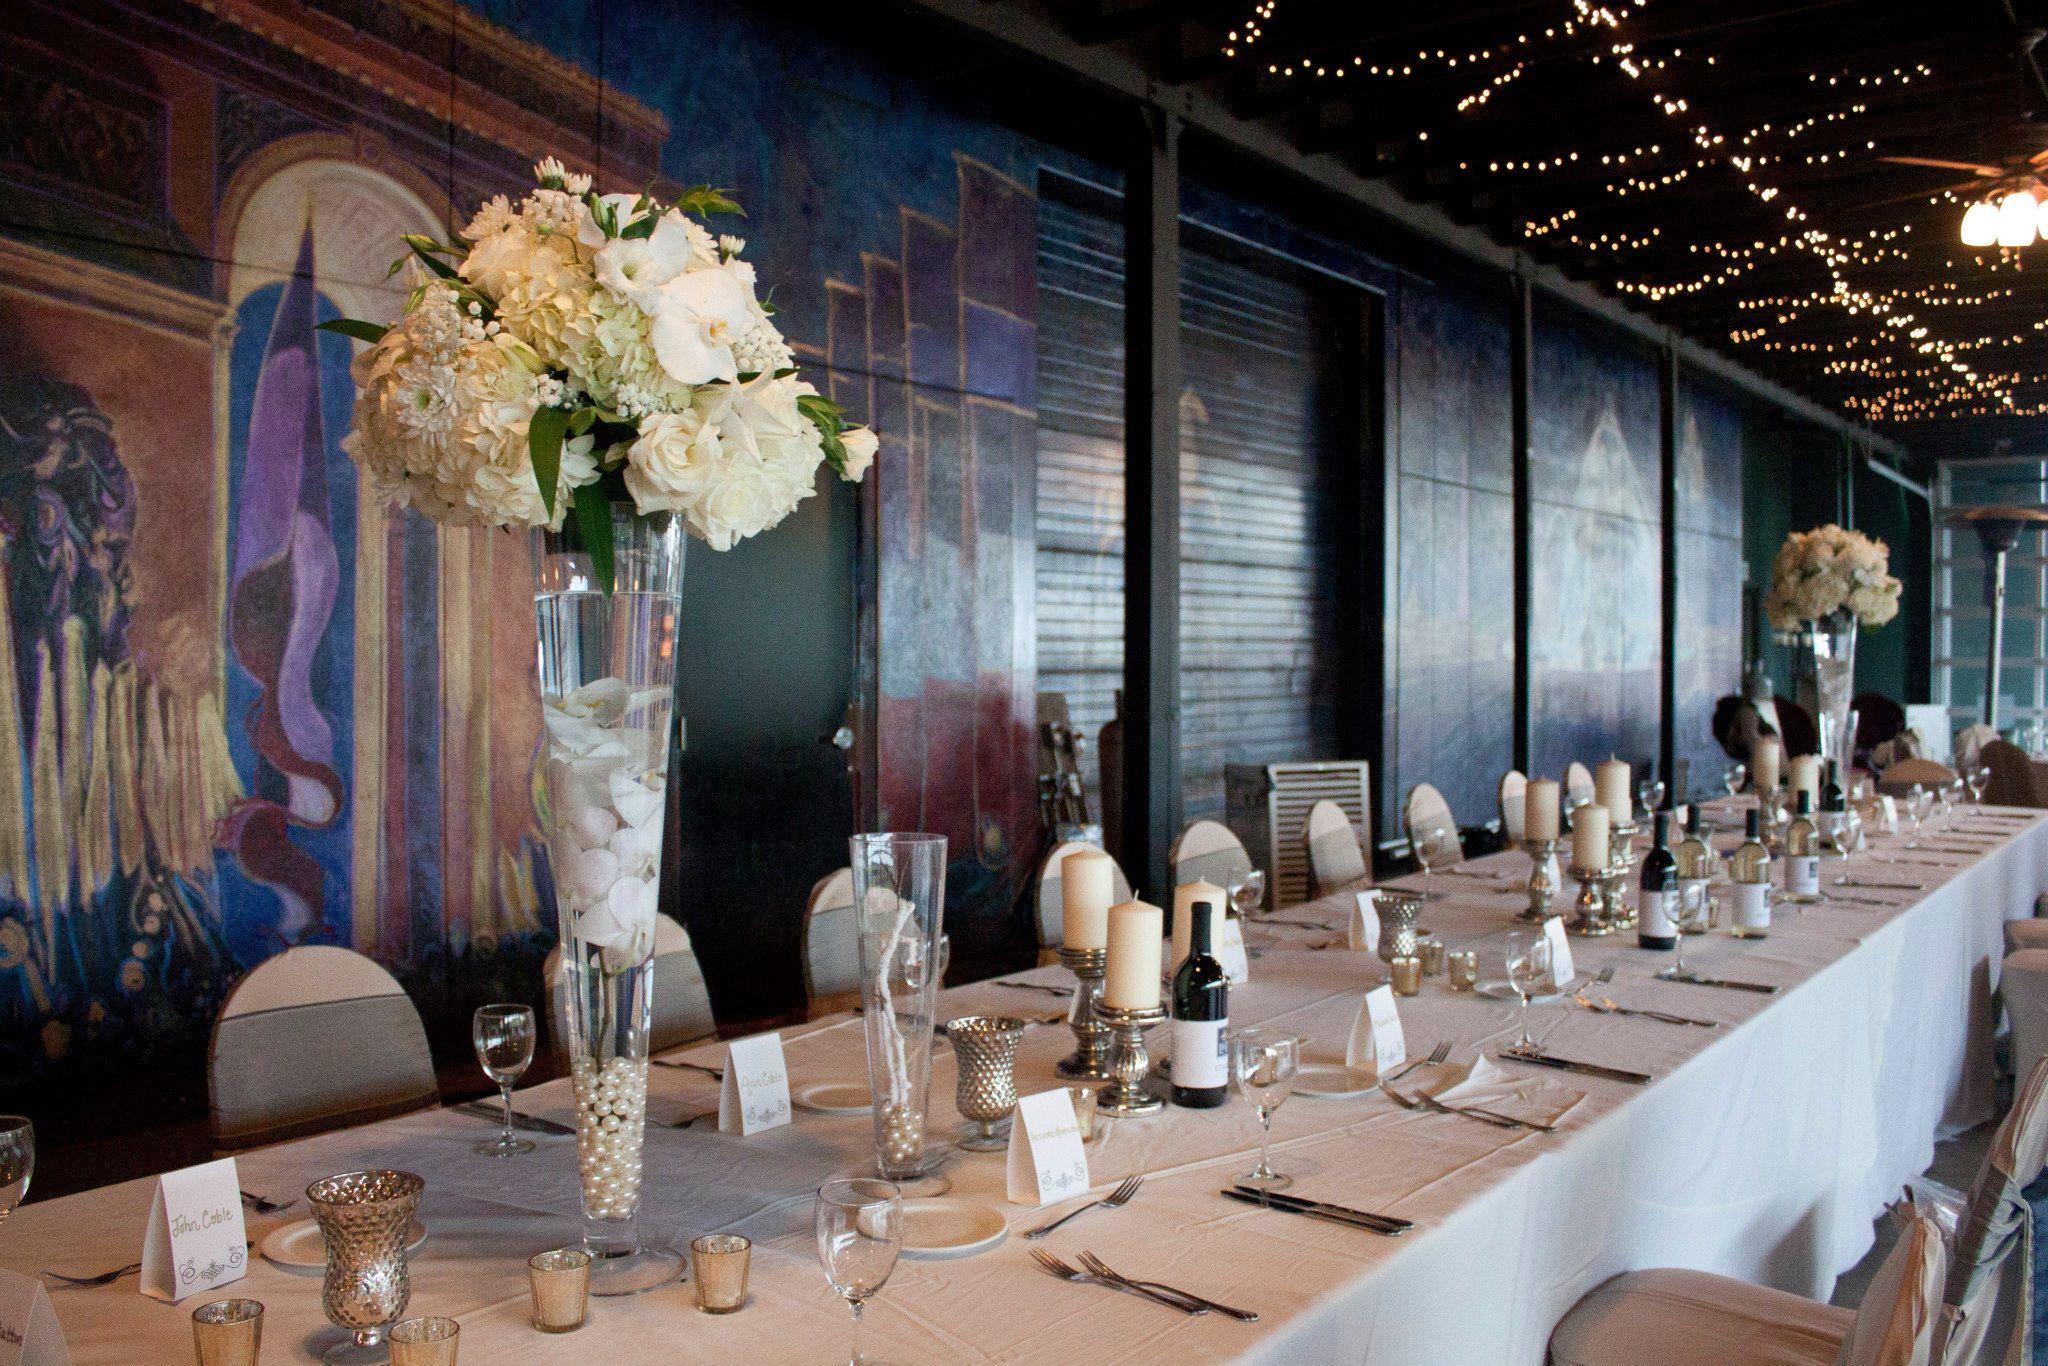 Lovely white wedding reception decor in the Chateau Elan Winery Pavillion